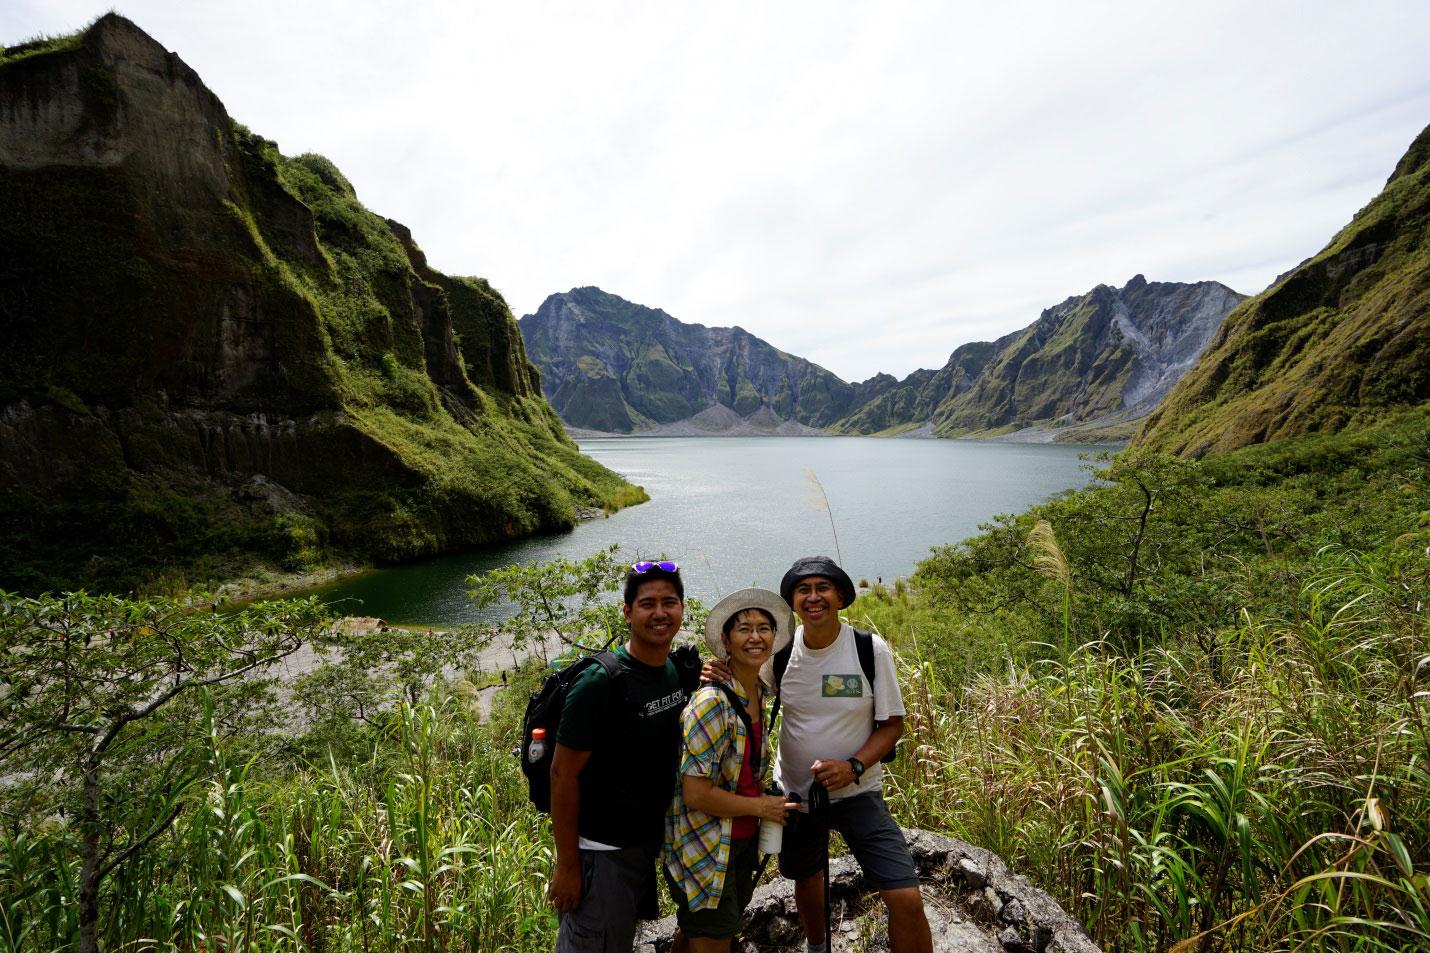 Pinatubo Crater Lake (Photo courtesy of Sonny Siasoco)